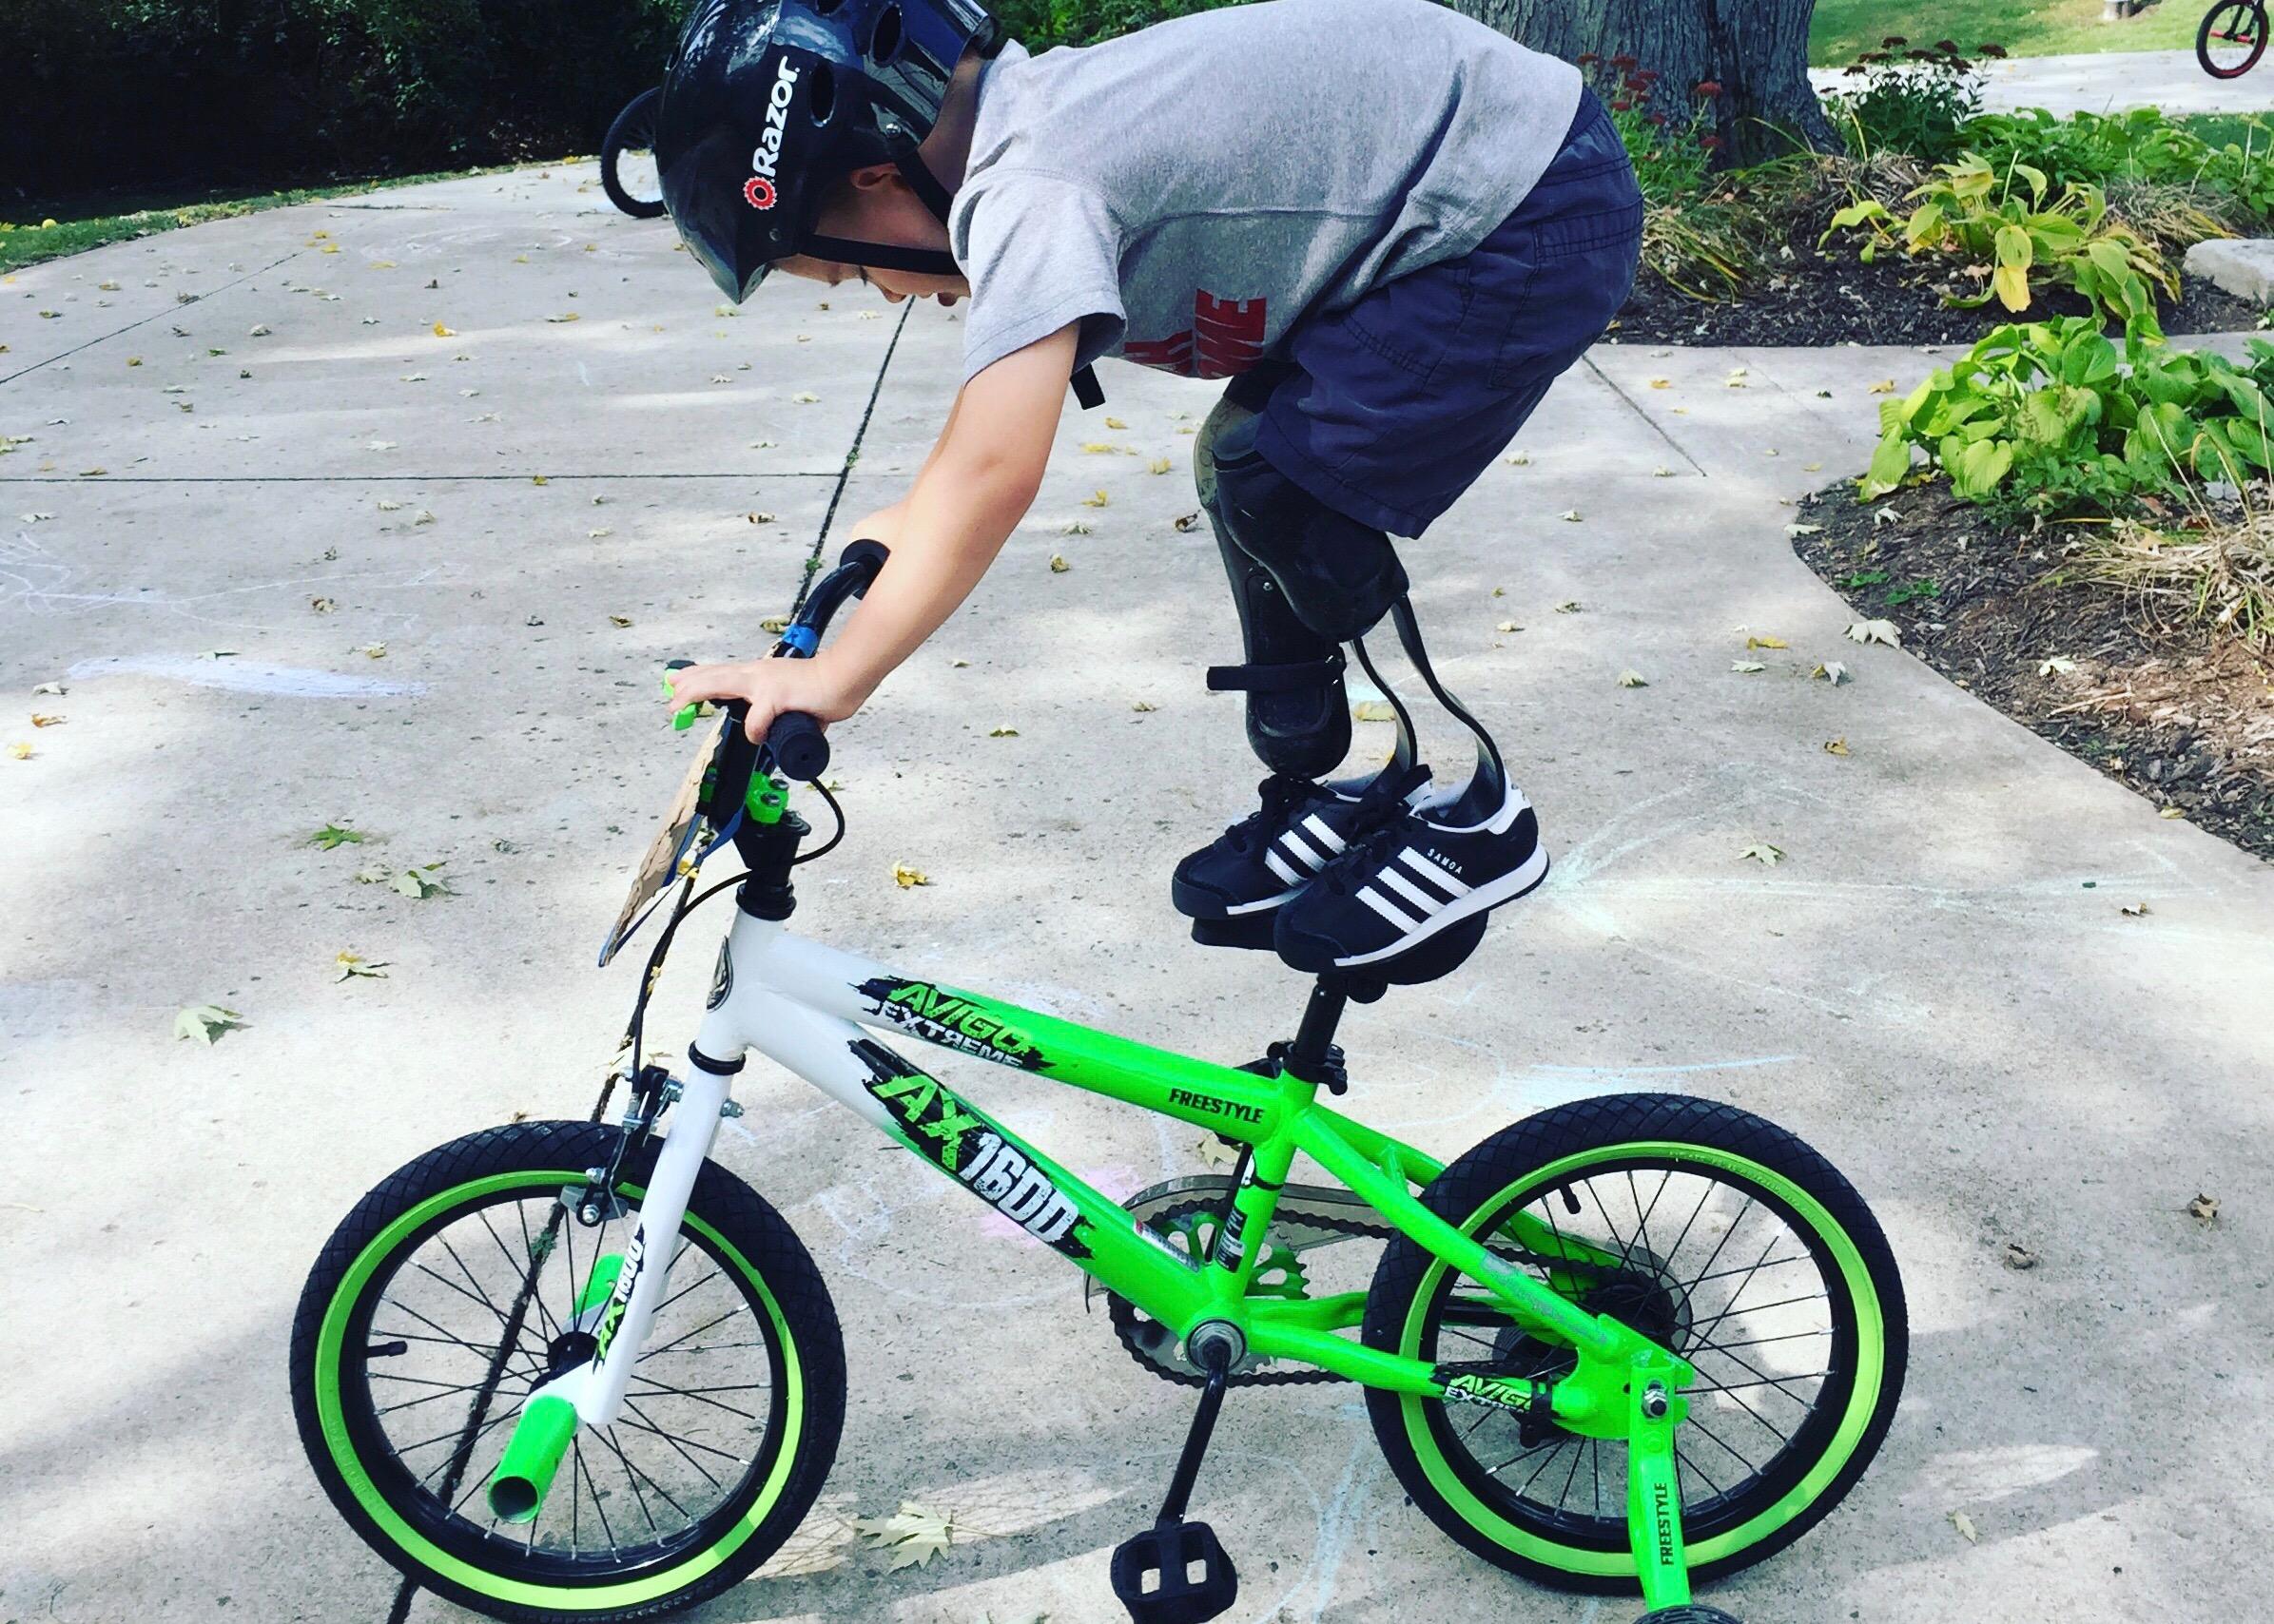 Judestandingonbike